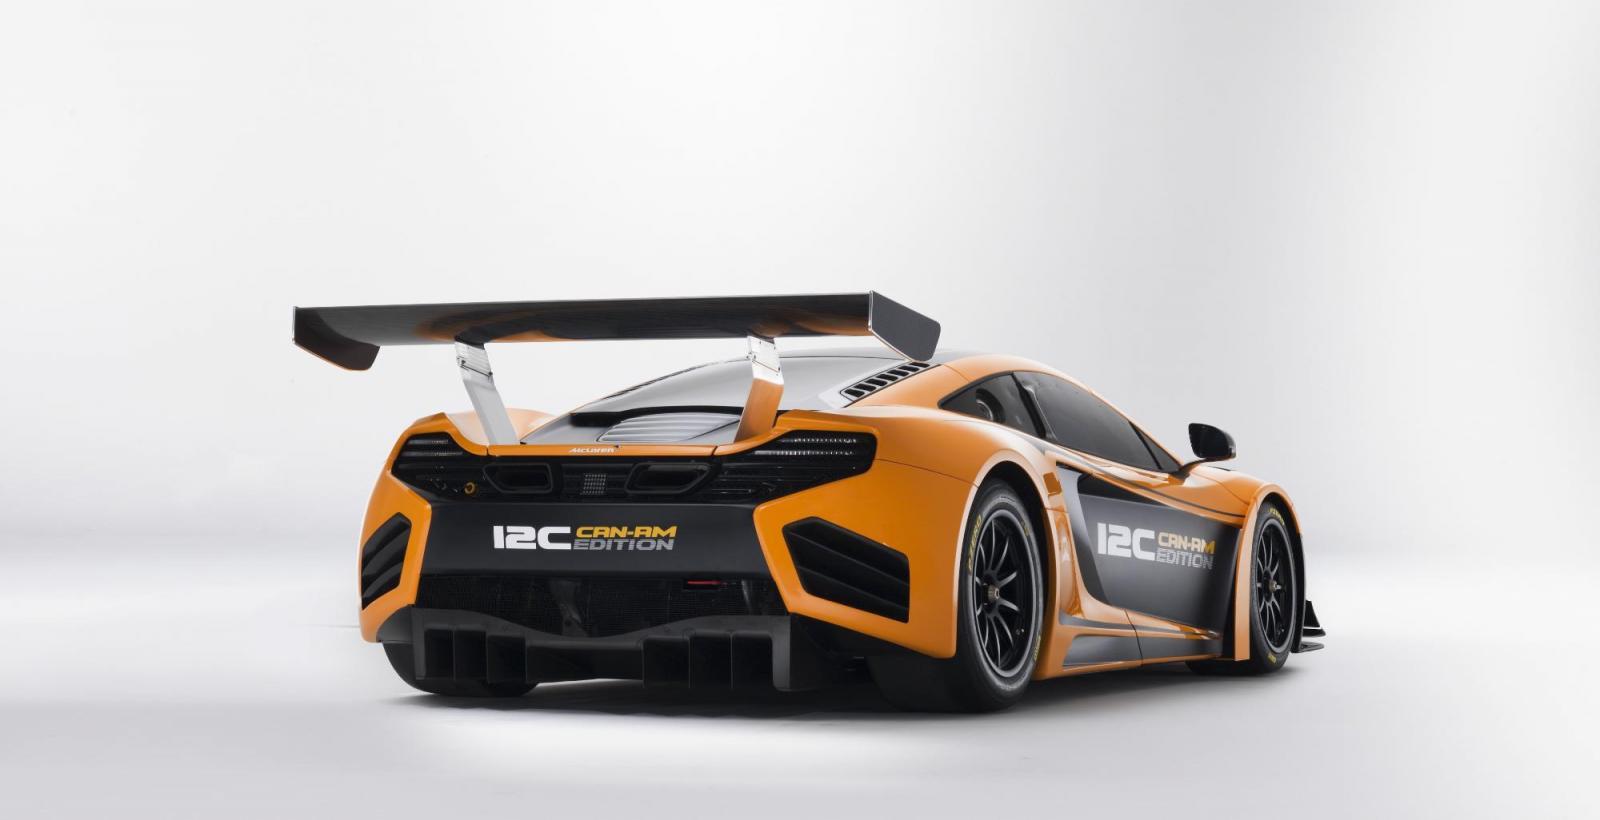 http://images.caradisiac.com/images/0/3/5/5/80355/S0-McLaren-MP4-12C-Cam-Am-Edition-Racing-Concept-268719.jpg